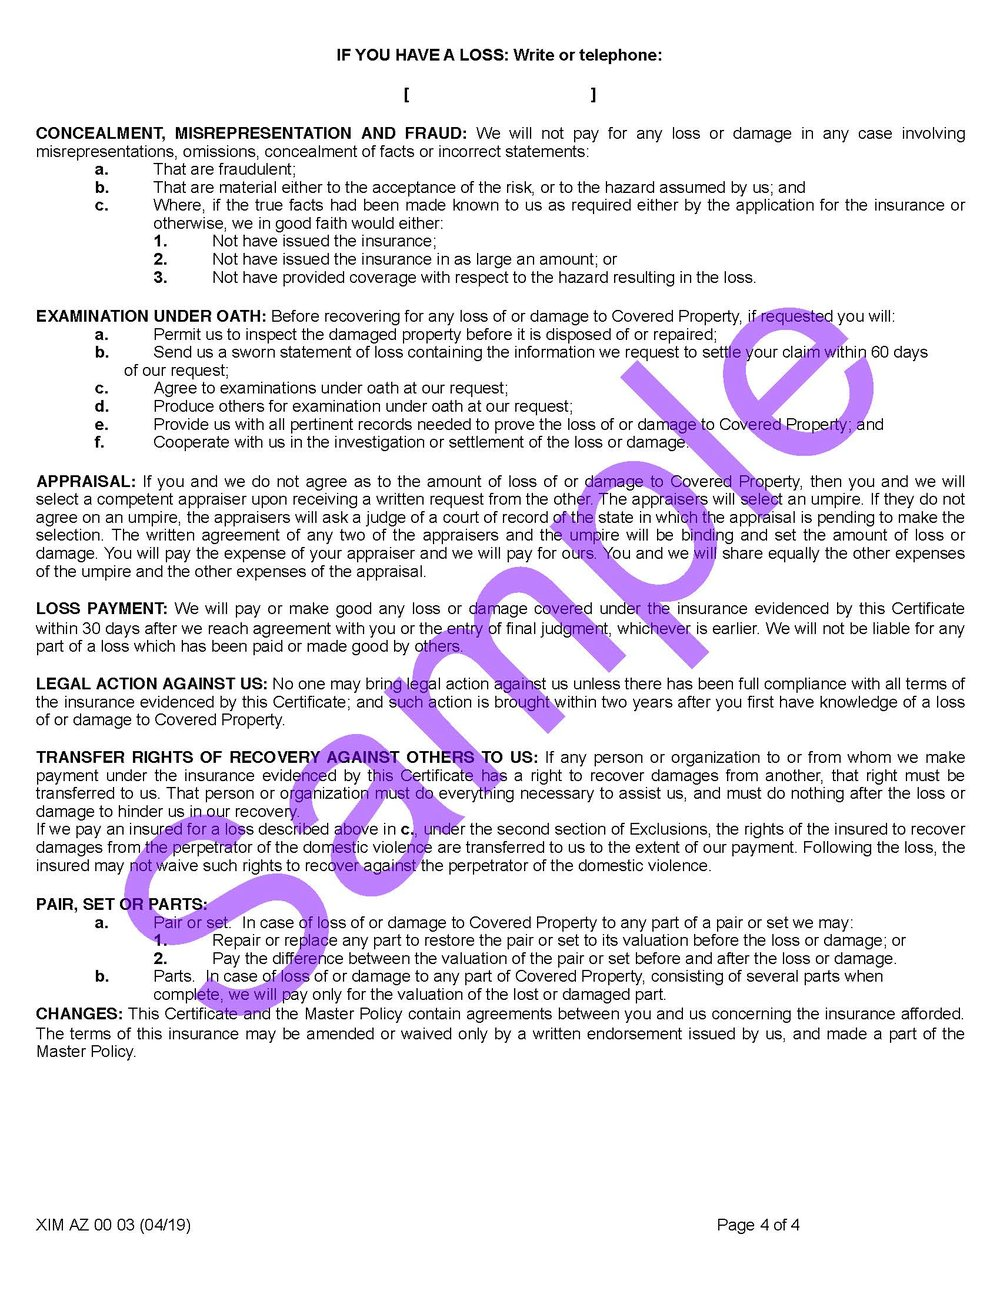 XIM AZ 00 03 04 19 Arizona Certificate of Insurance_Page_4.jpg